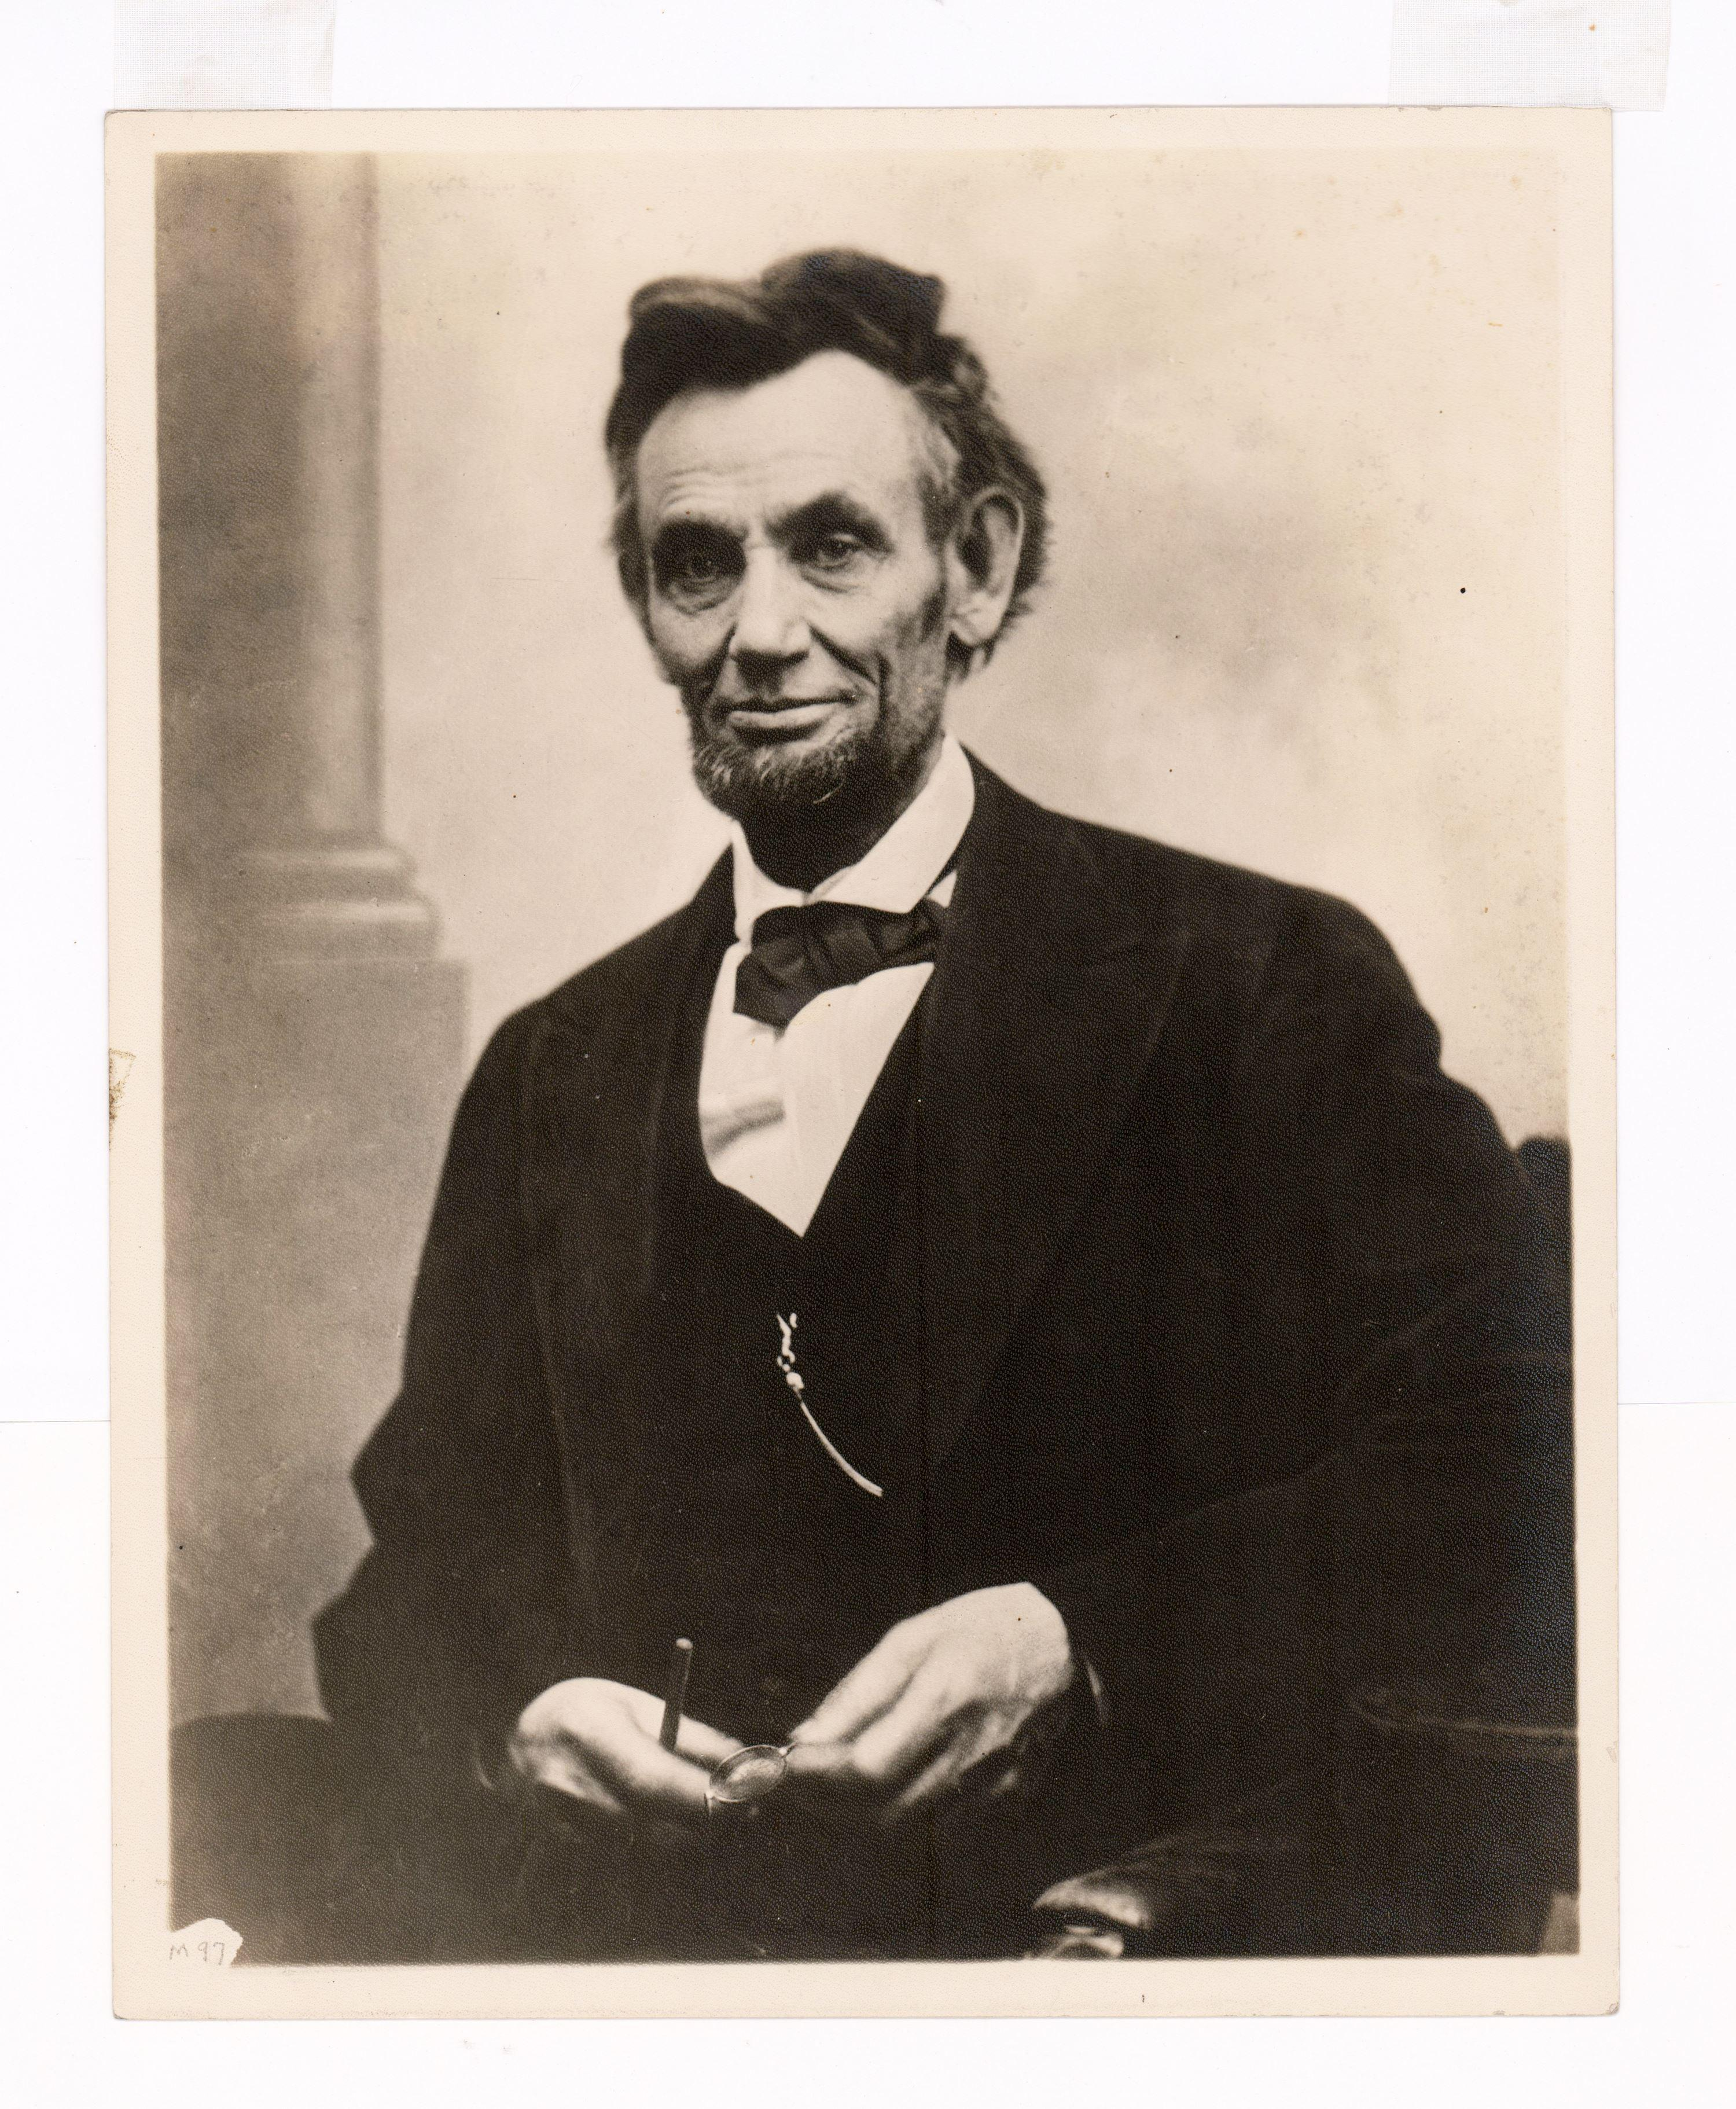 Impressively Sized Vintage Print of President Abraham Lincoln